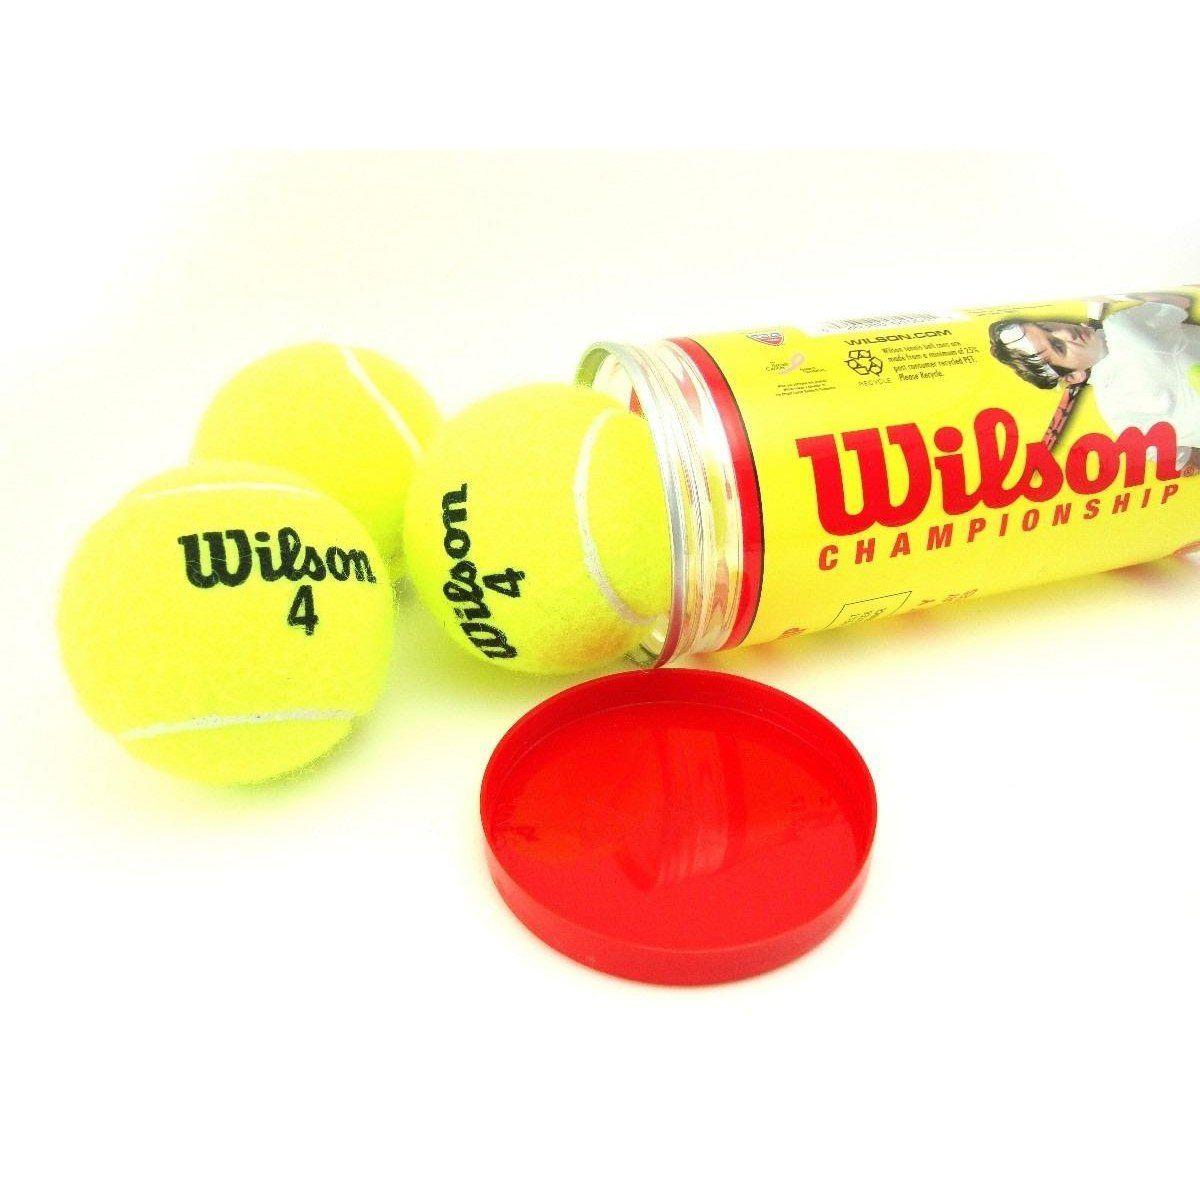 be04470597 Bola De Tênis Wilson Championship Extra Duty - Sou Tenista